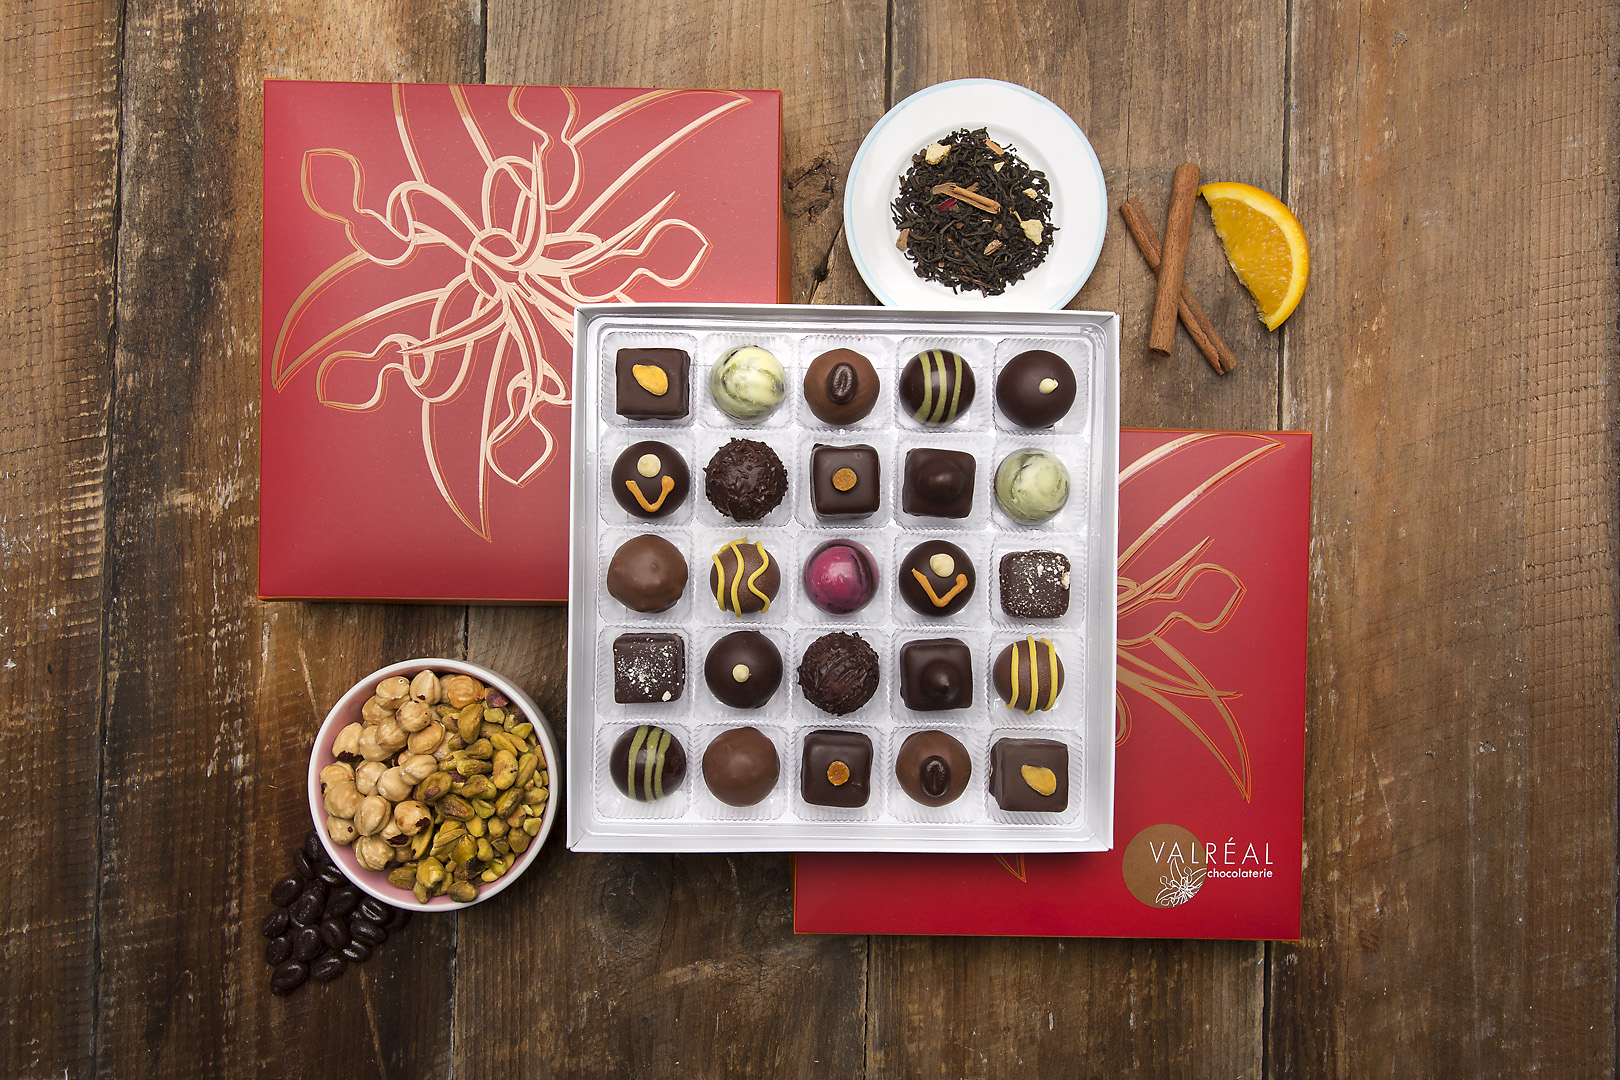 photographe-chocolat-produit-bouquet-valreal-001